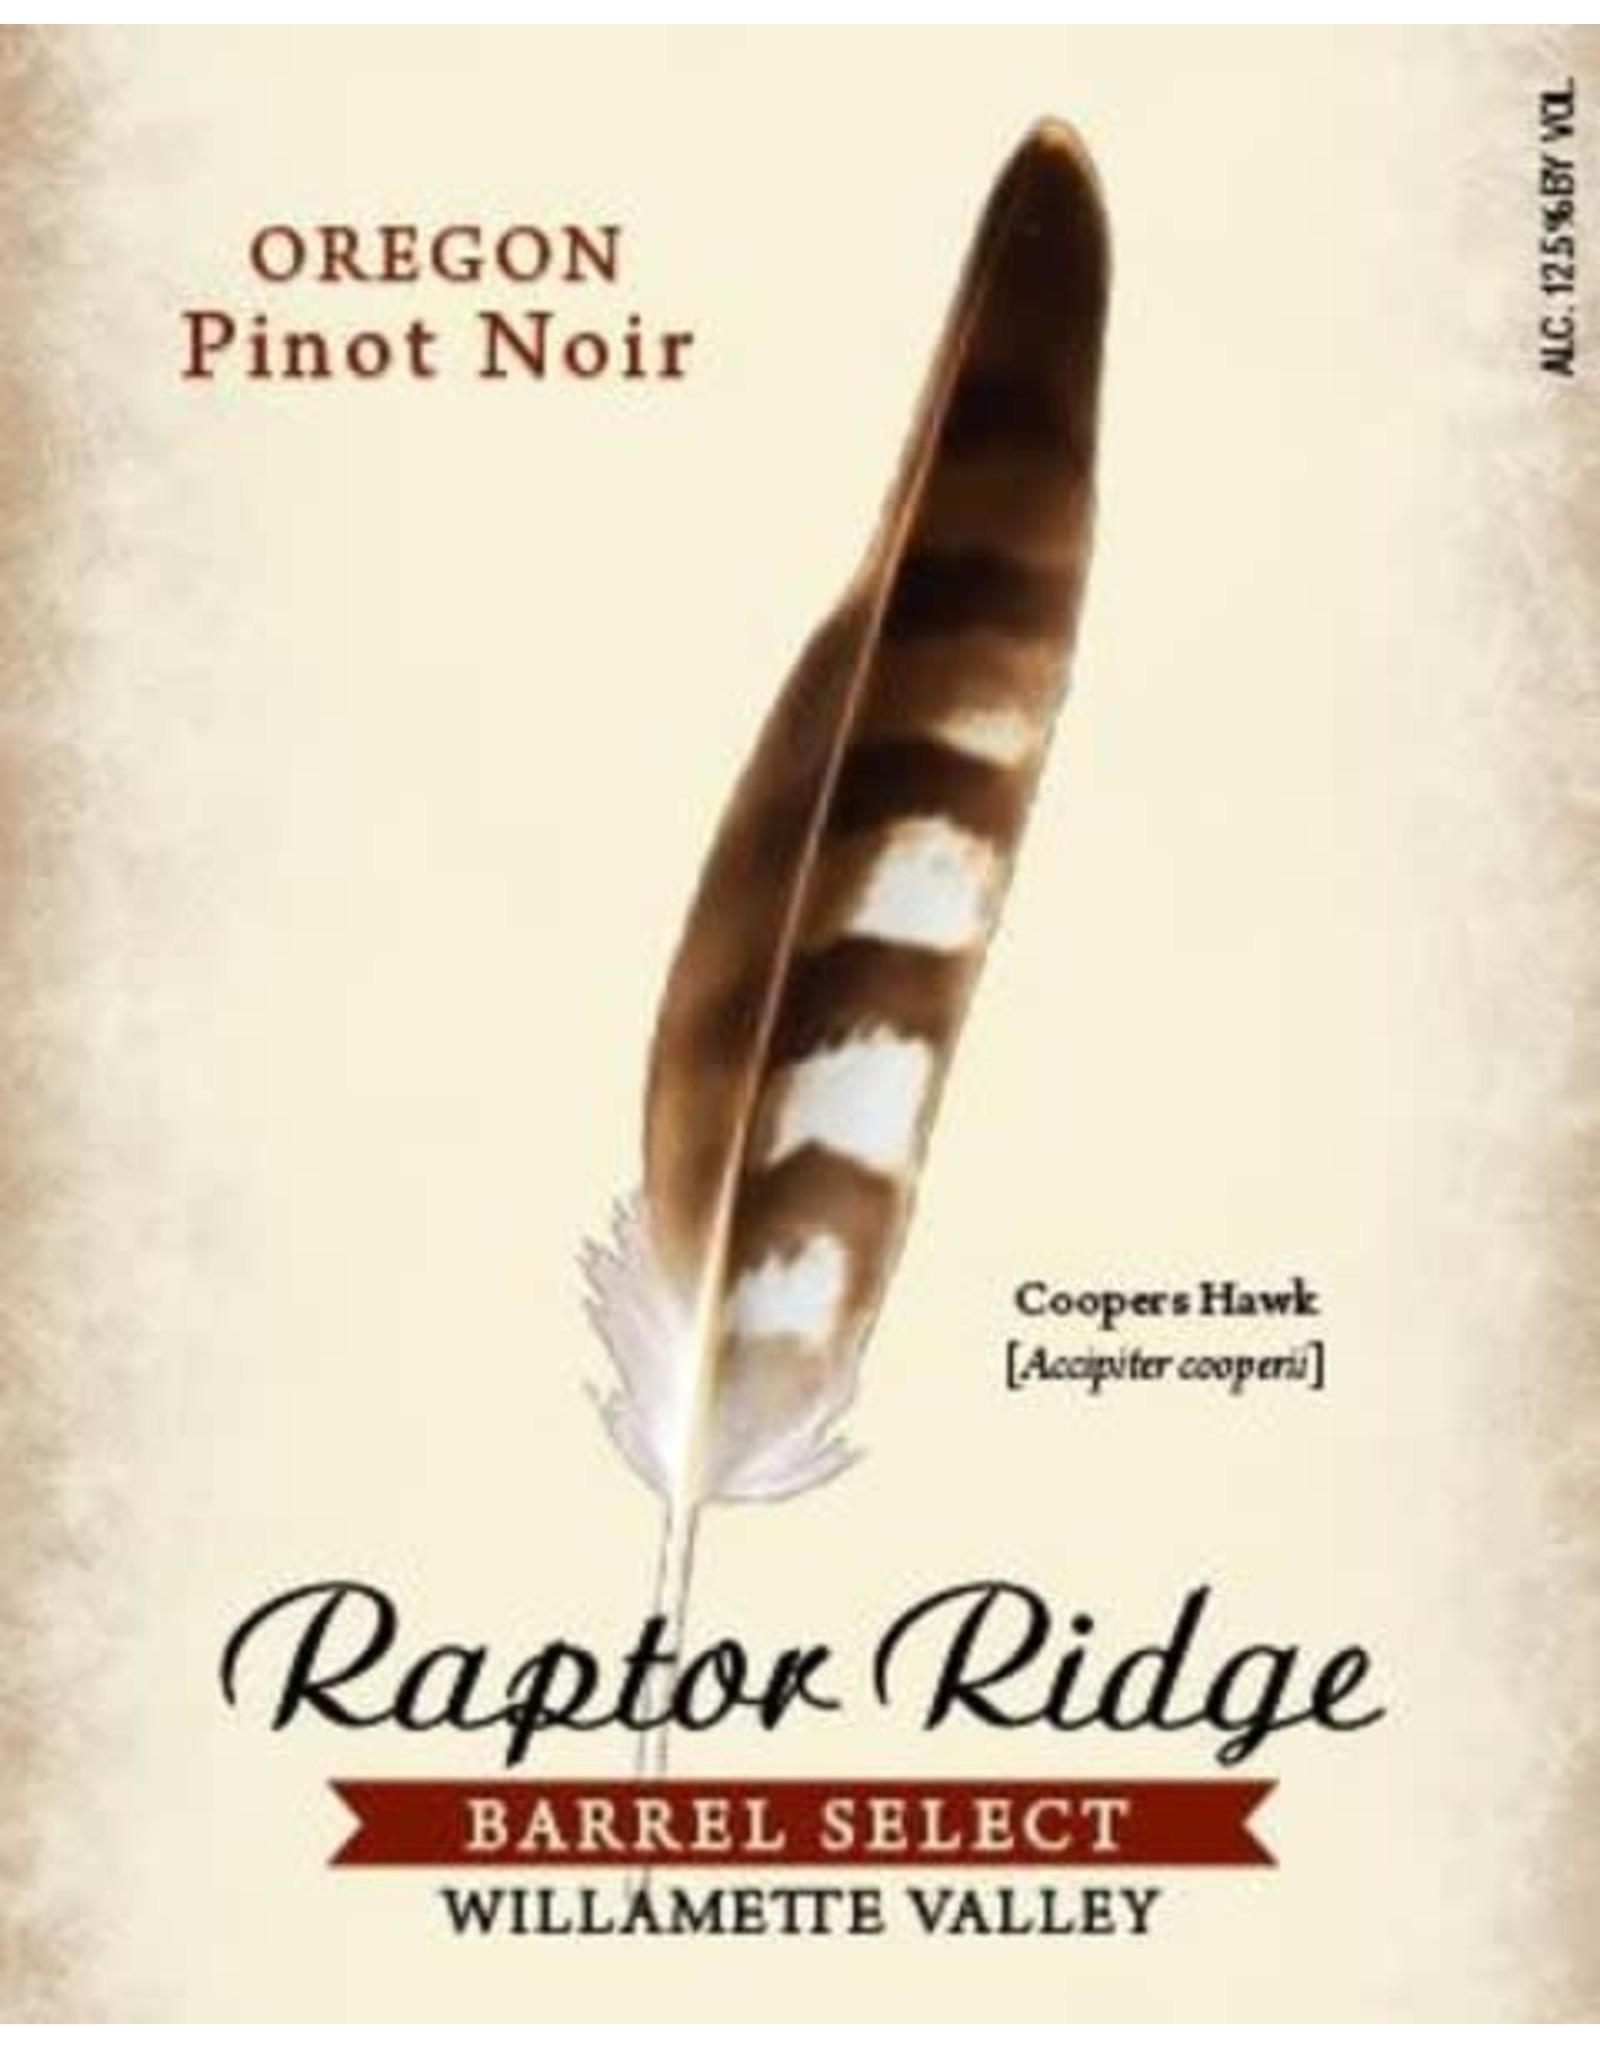 RAPTOR RIDGE PINOT NOIR 2018  750ML